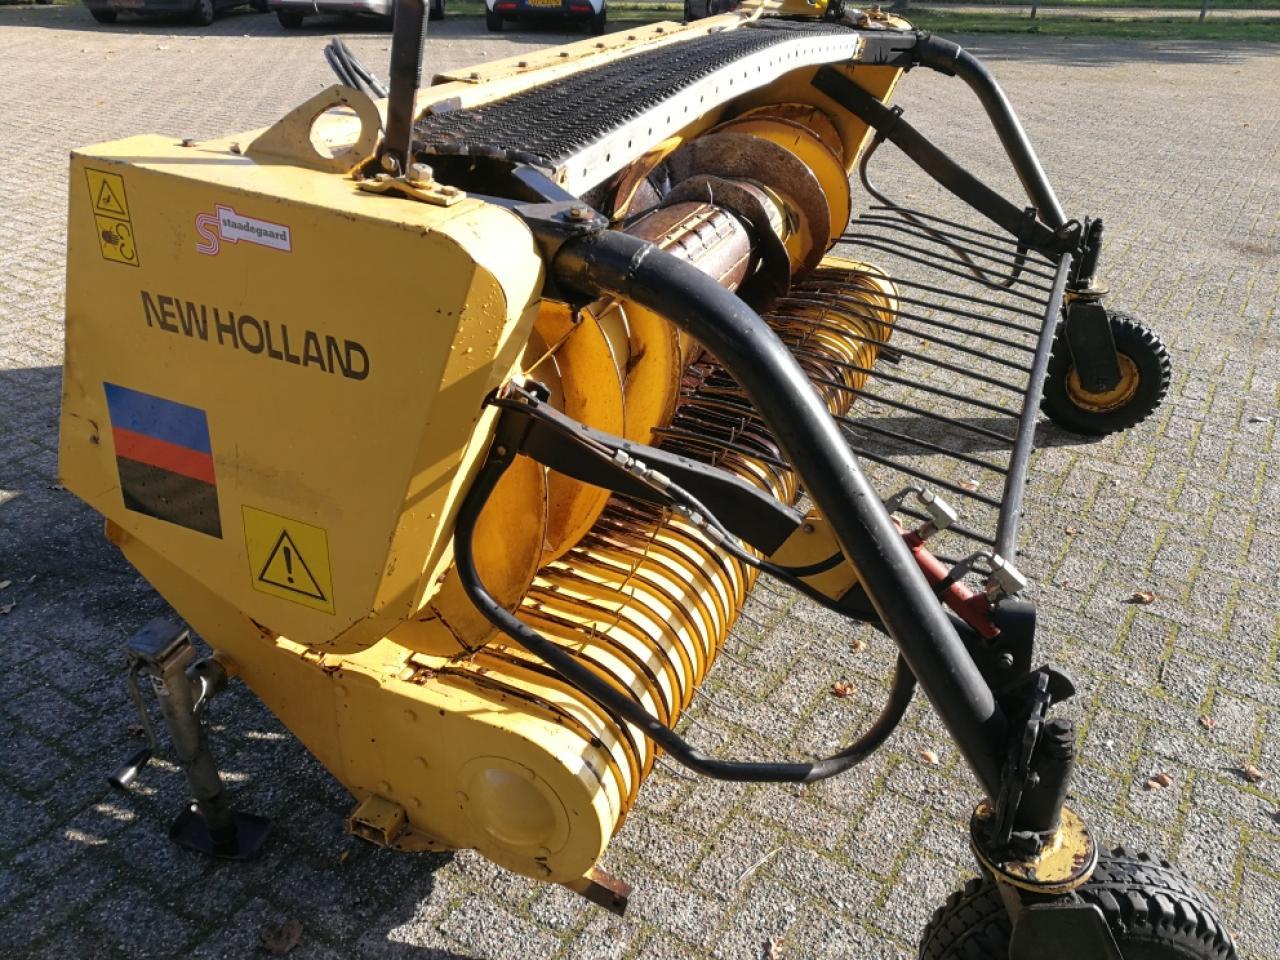 New Holland 340W